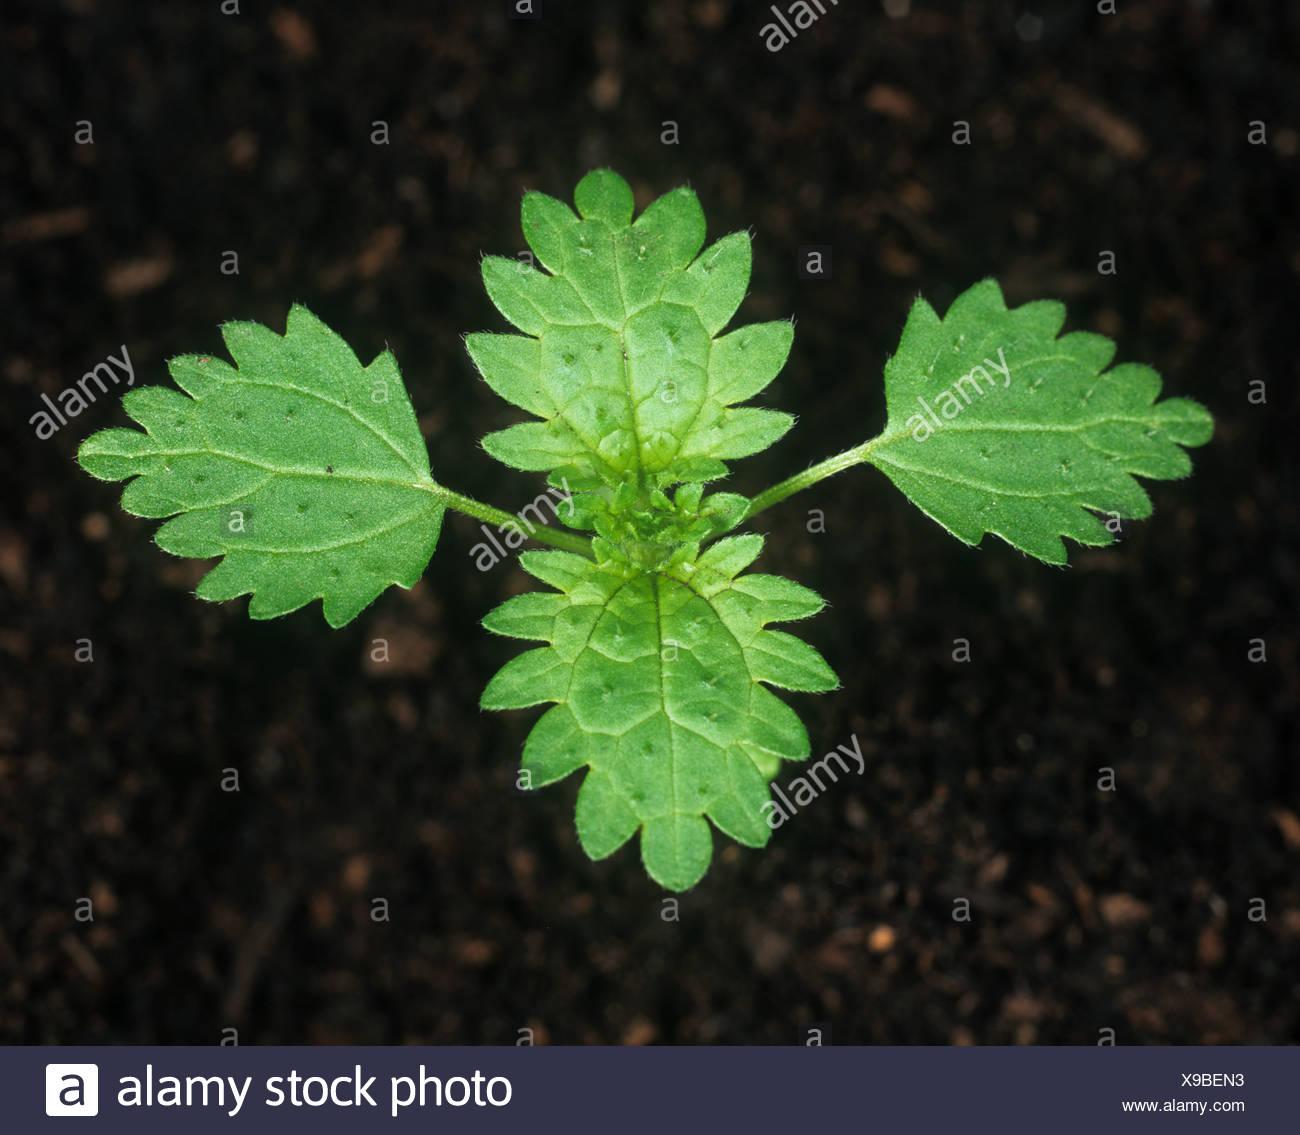 annual-nettle-urtica-urens-seedling-with-four-true-leaves-X9BEN3.jpg